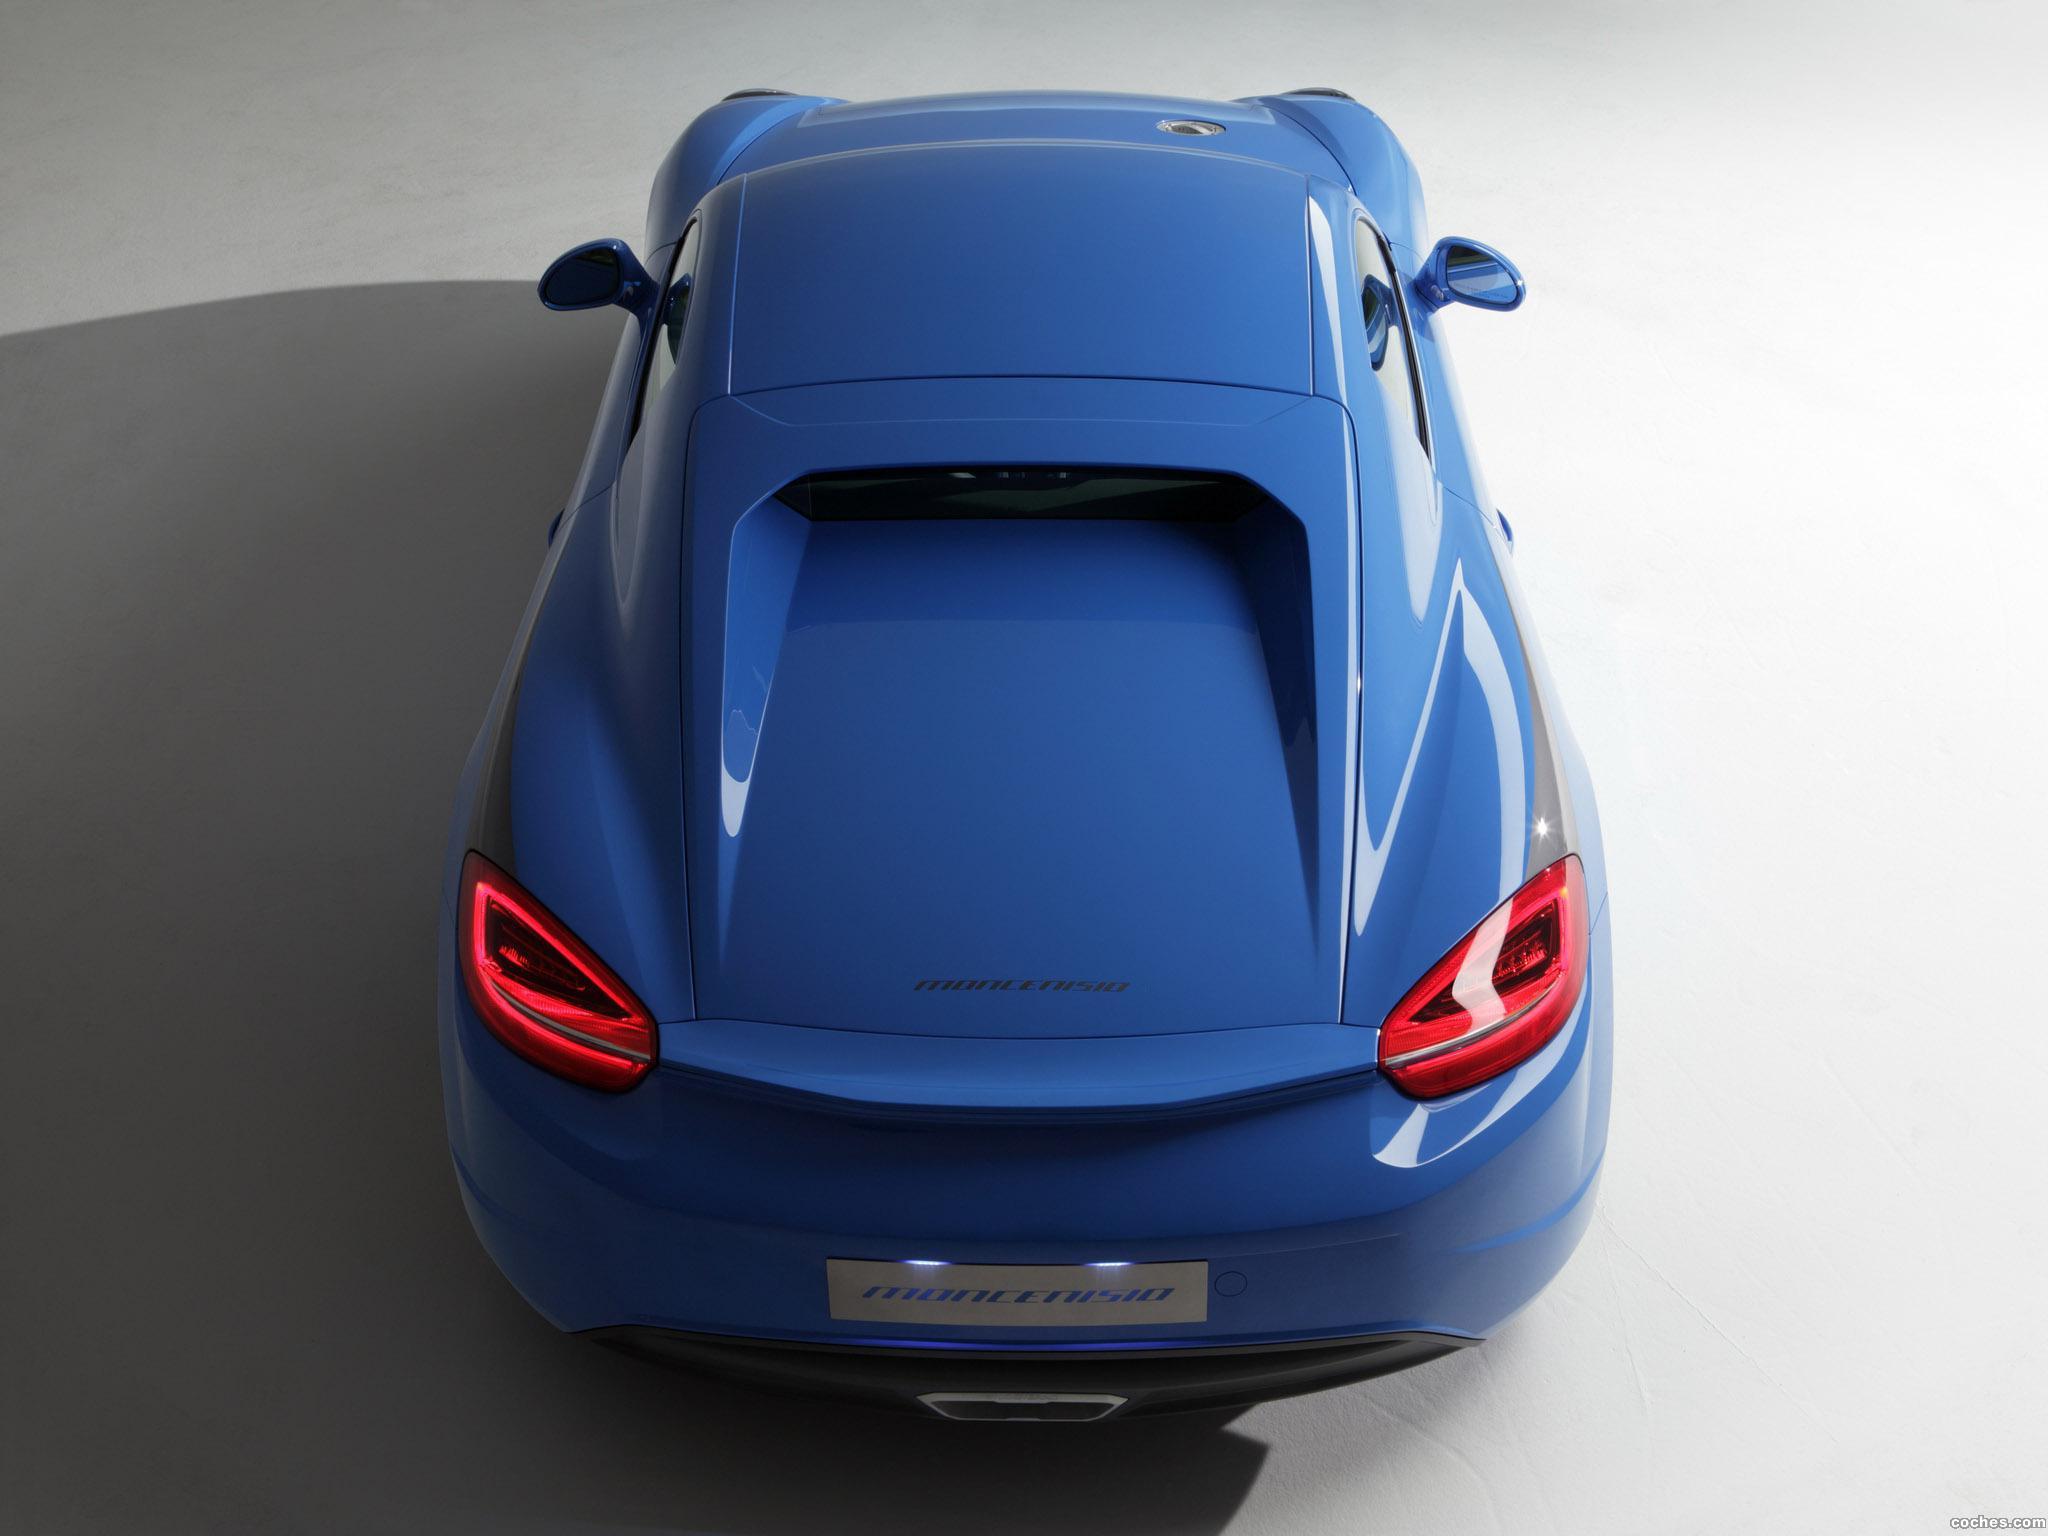 Foto 1 de Porsche Studiotorino Cayman Moncenisio 2014